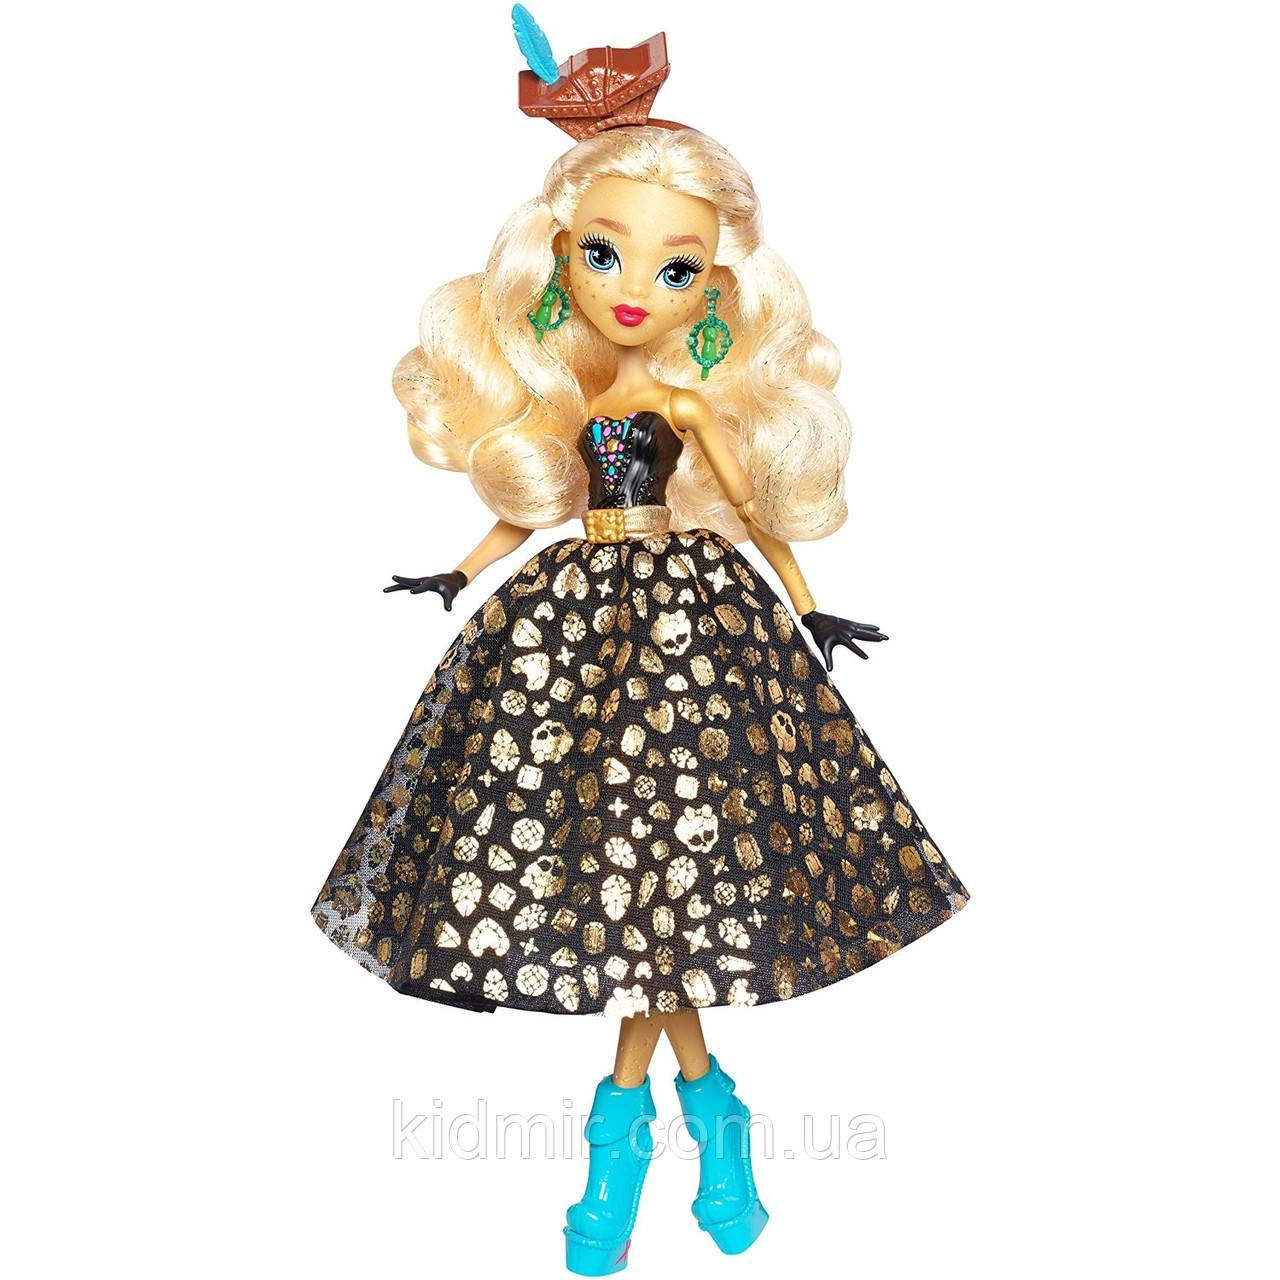 Кукла Monster High Дана Трежур Джонс (Dayna Treasura Jones) из серии Shriek Wrecked Монстр Хай